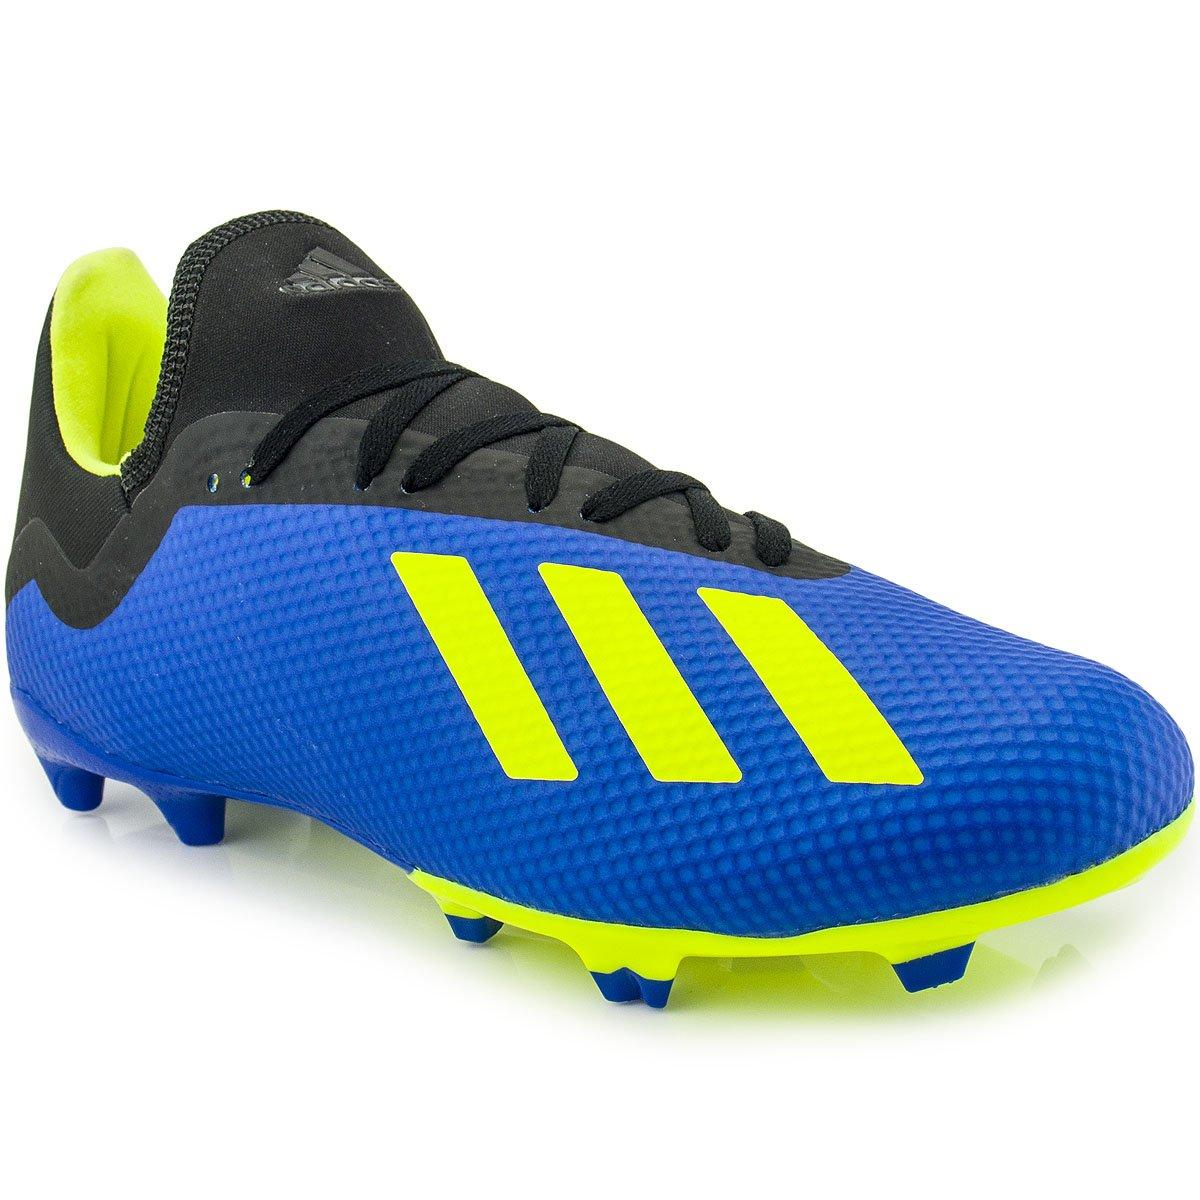 2039b5f71d6dd Chuteira Adidas X 18.3 FG   Futebol Campo   MaxTennis